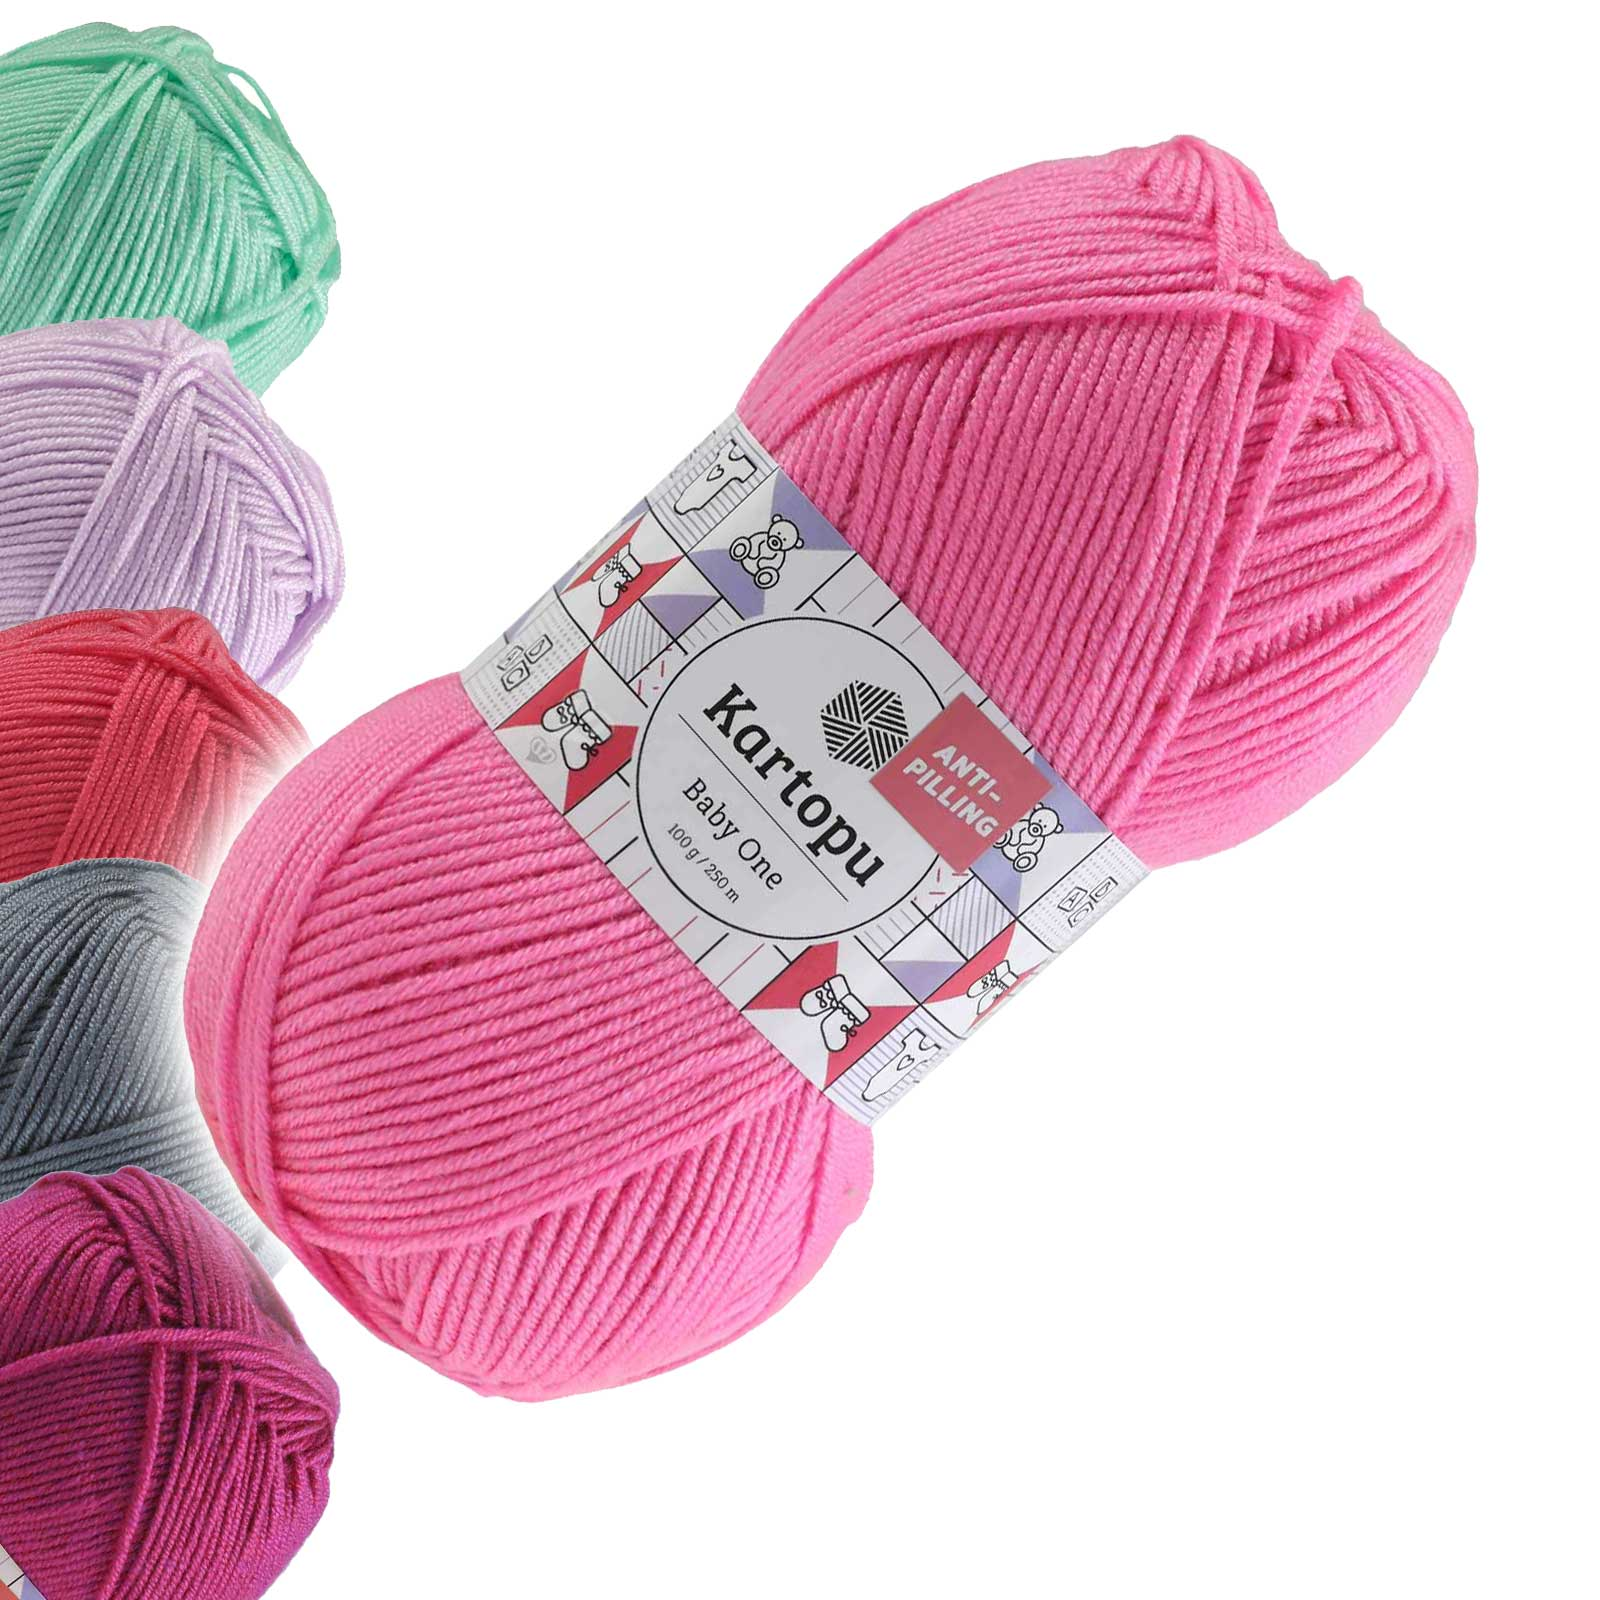 100g Strickgarn Kartopu BABY ONE Antipilling Babywolle Babystrickgarn, Farbwahl – Bild 20